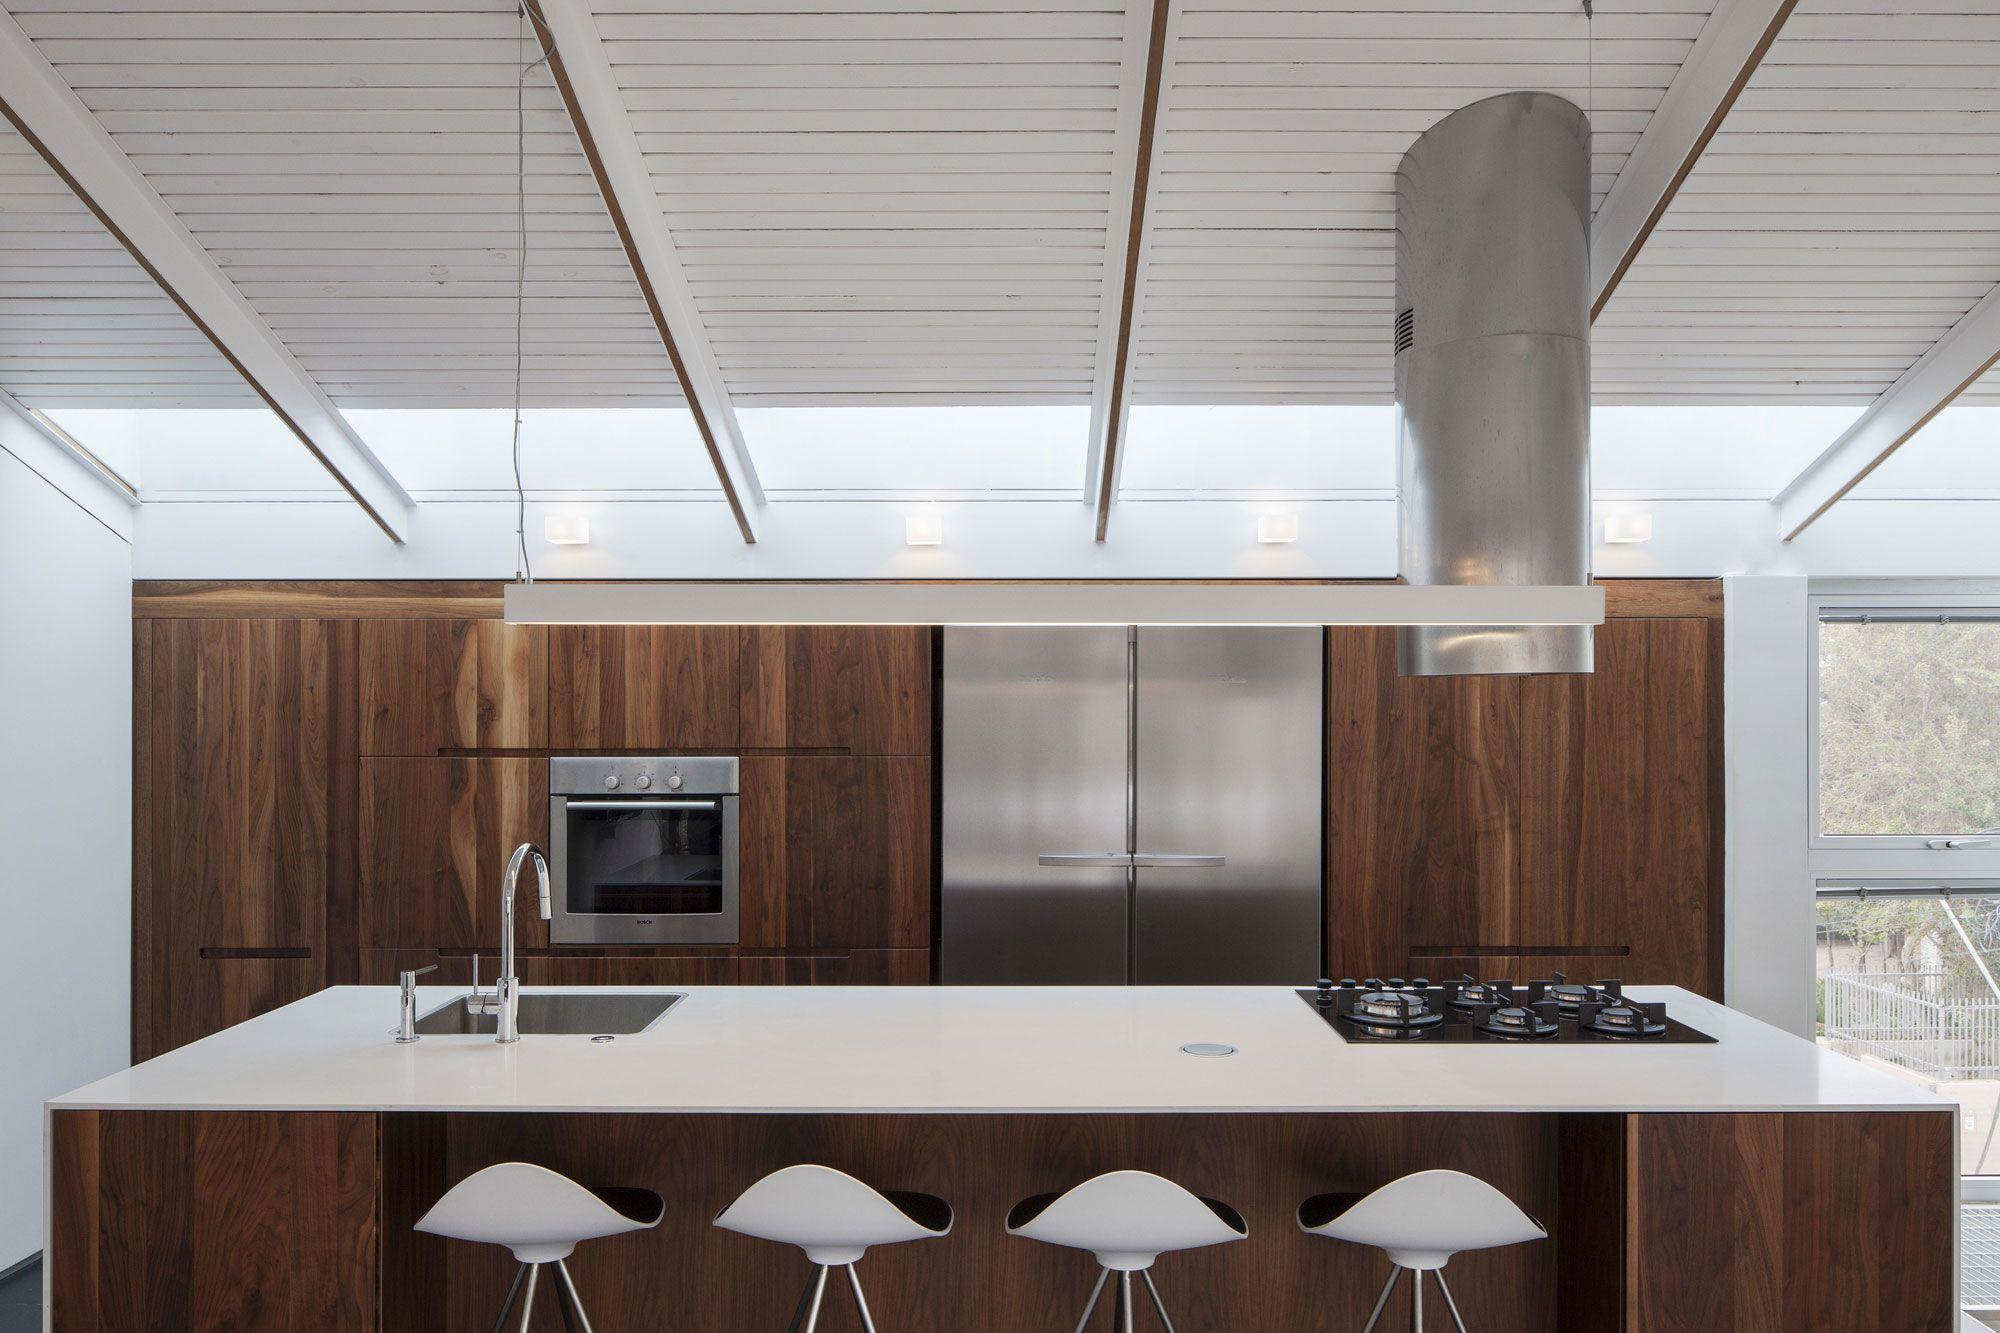 K House by Arbejazz Studio Architects   Kitchens   Pinterest ...